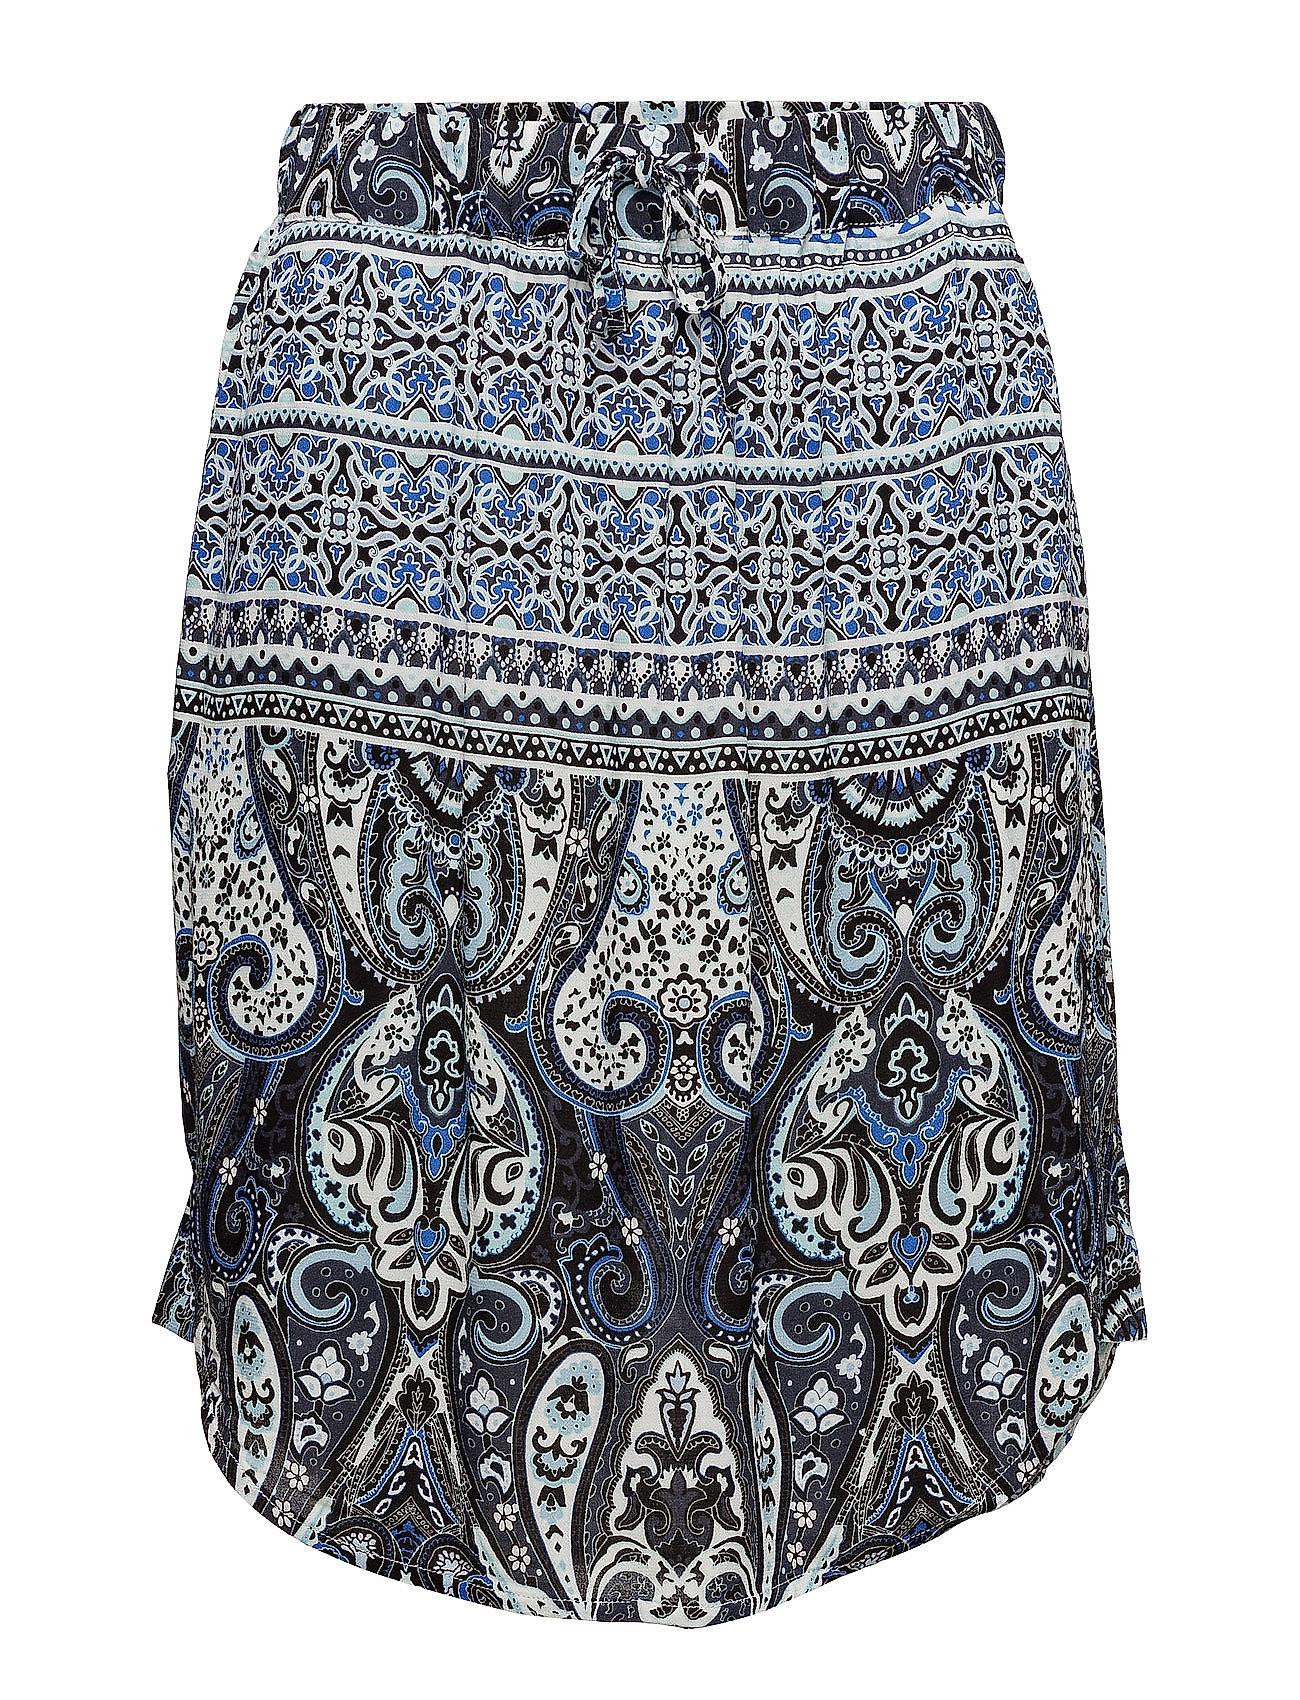 saint tropez – Paisley printed skirt på boozt.com dk